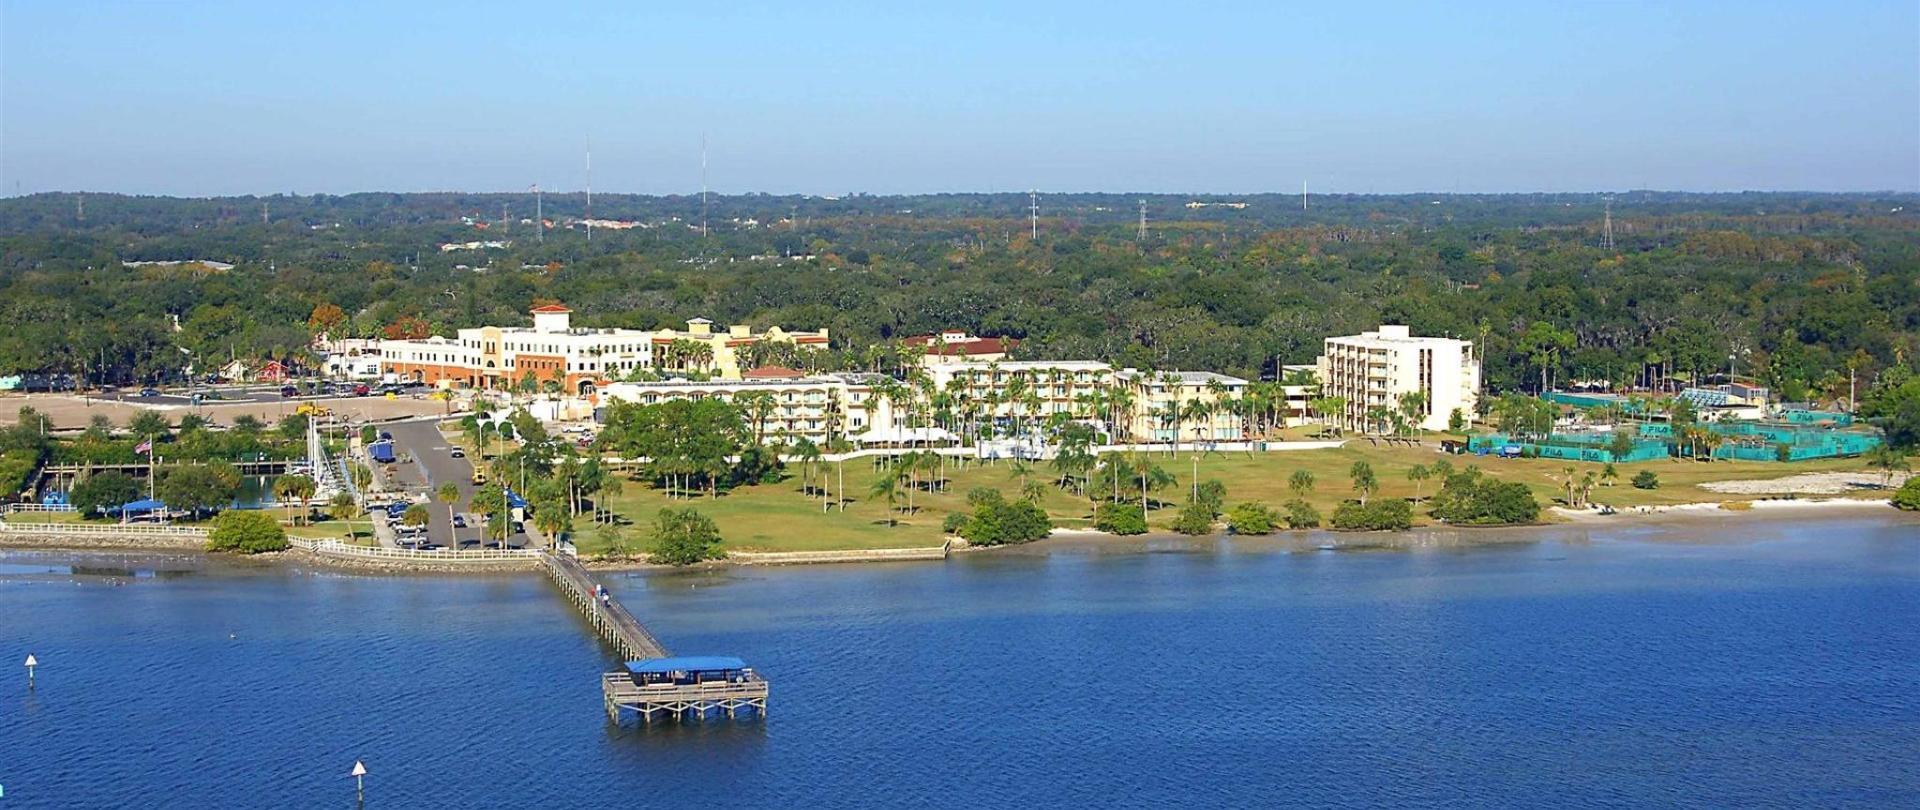 Harbor Resort And Spa Tampa